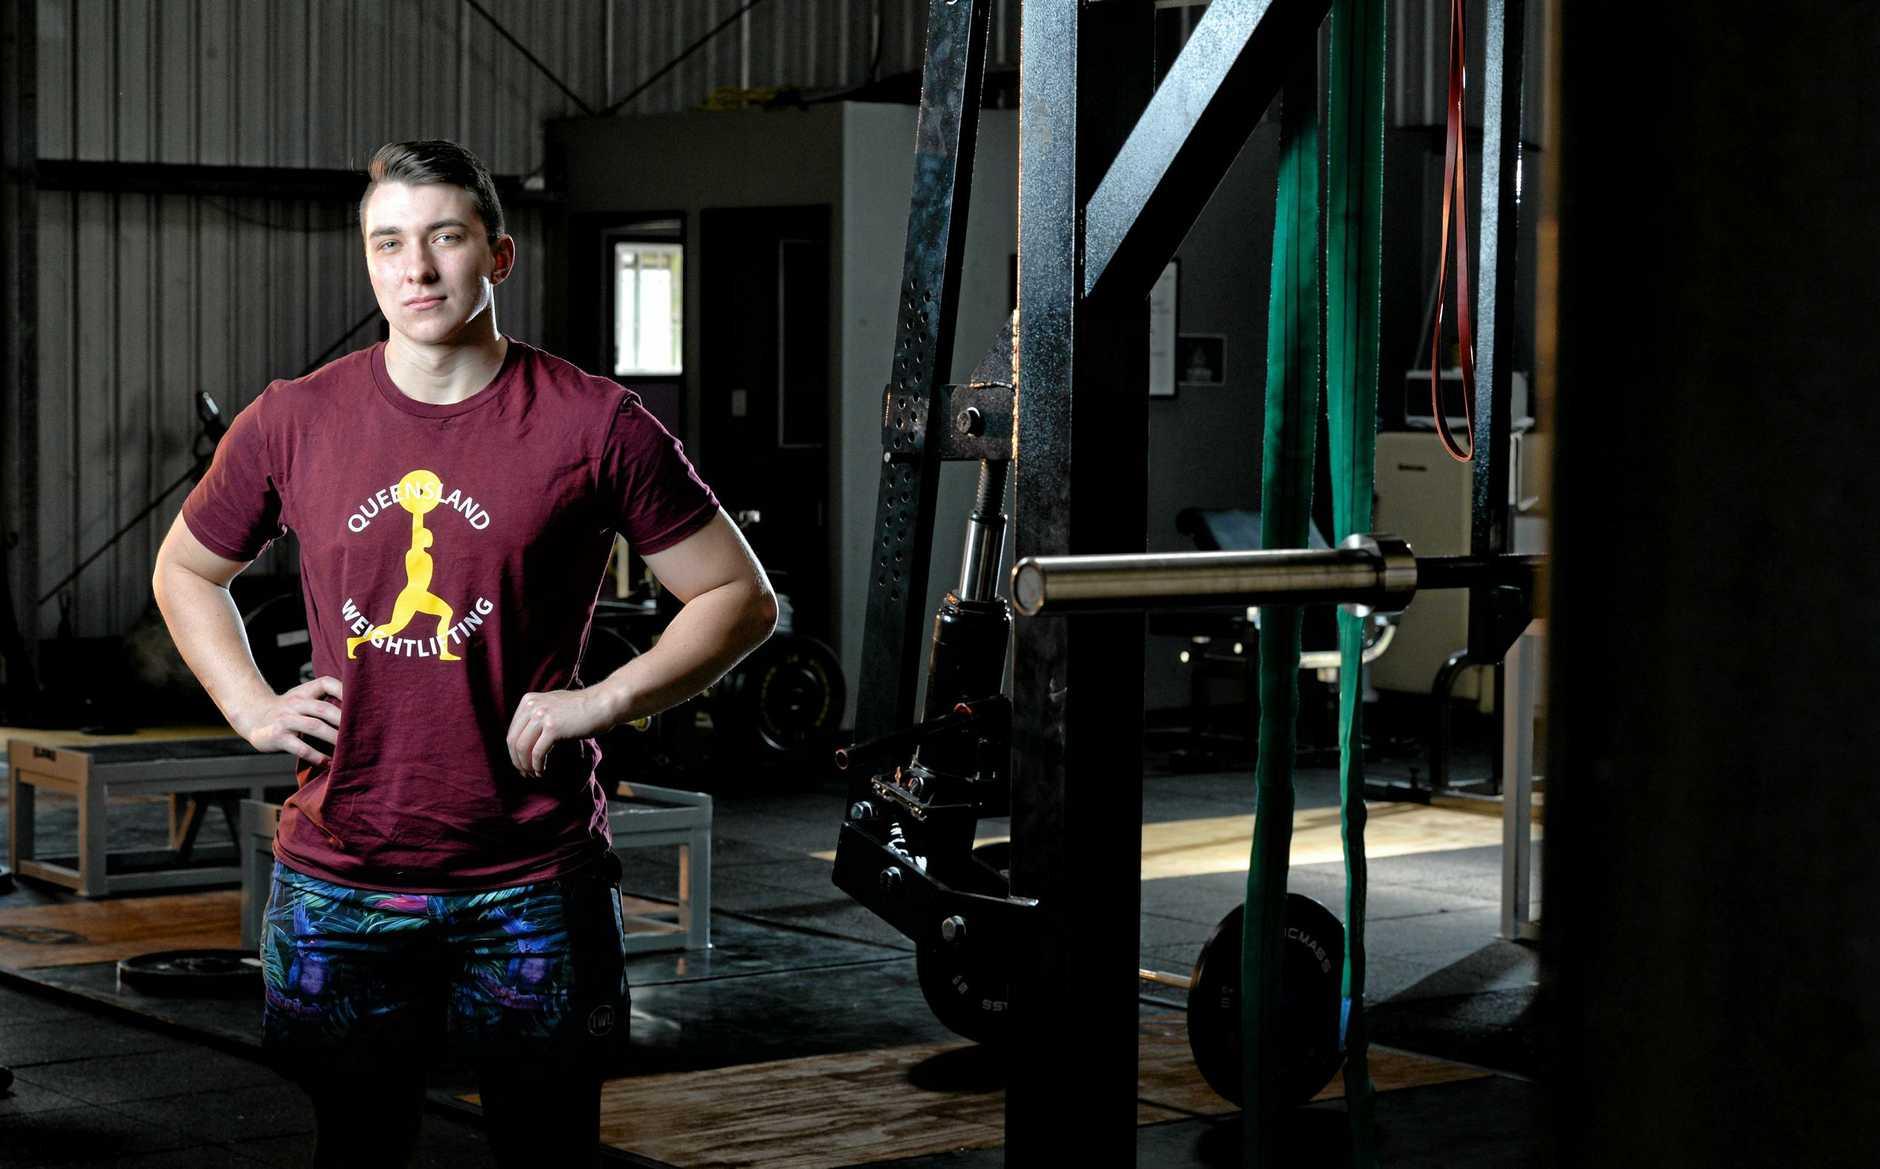 Braydan Fender is the Australian Weightlifting Federation junior champion.